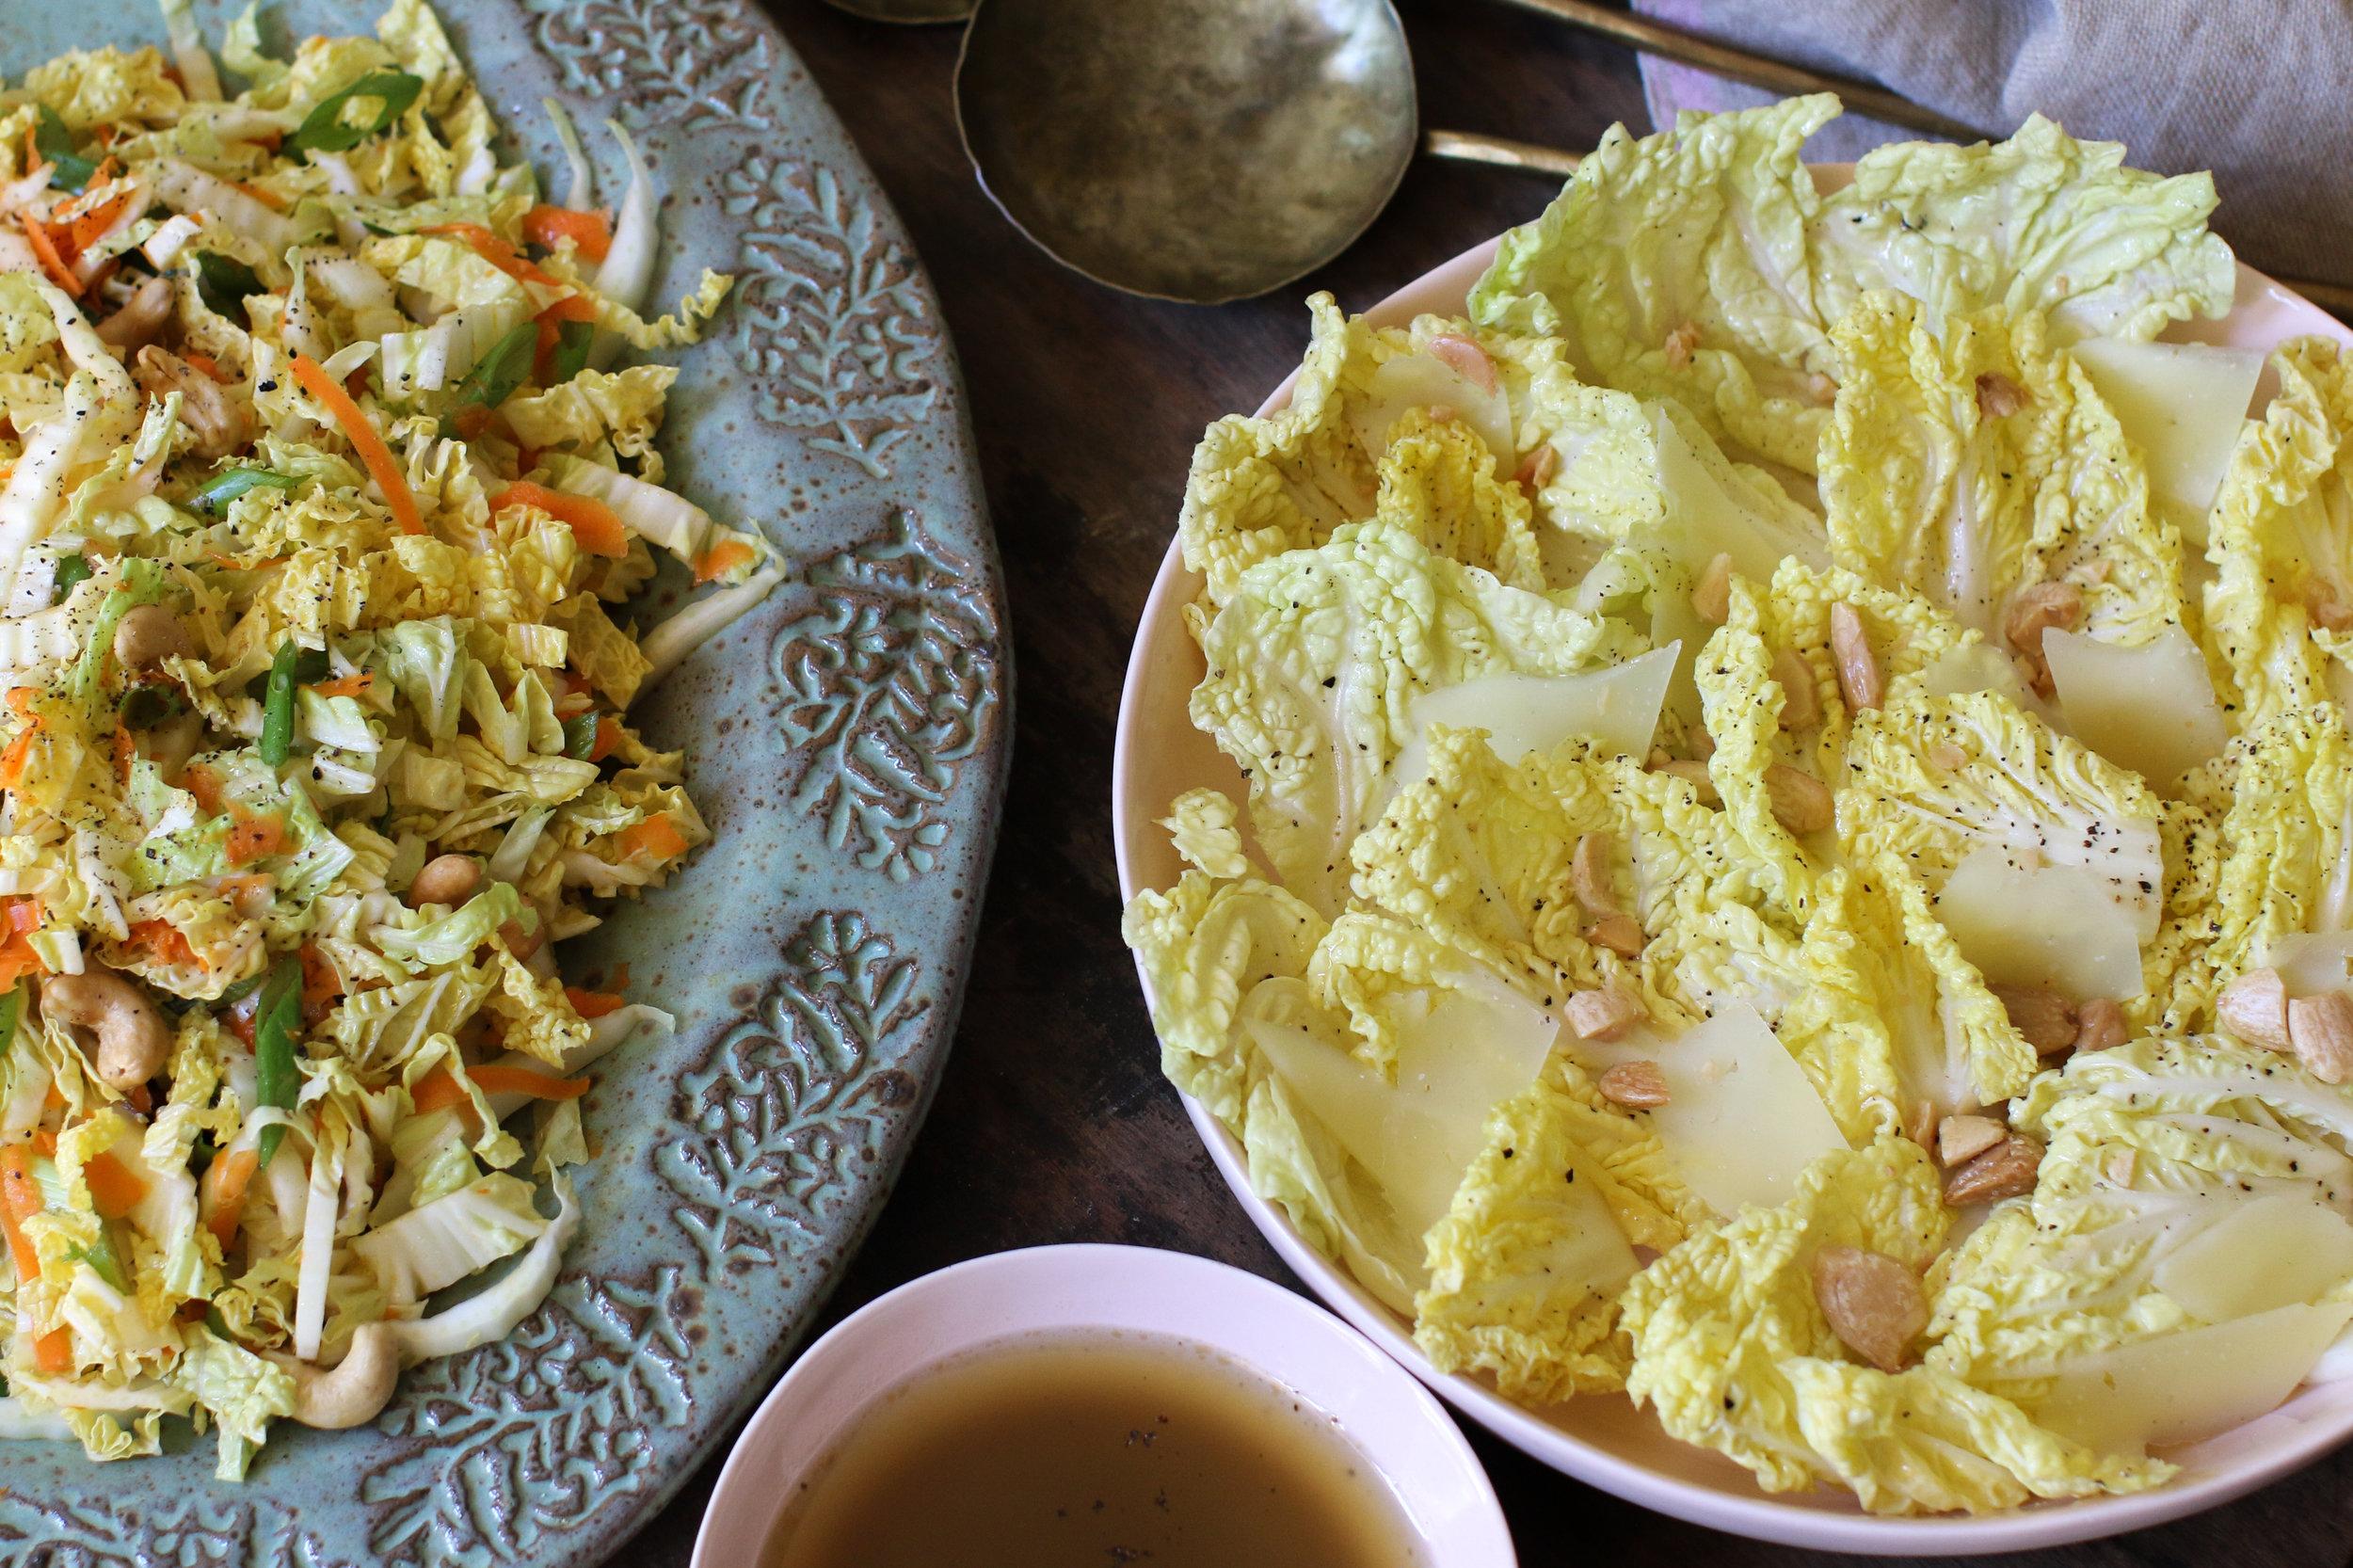 napa cabbage 4477.jpg